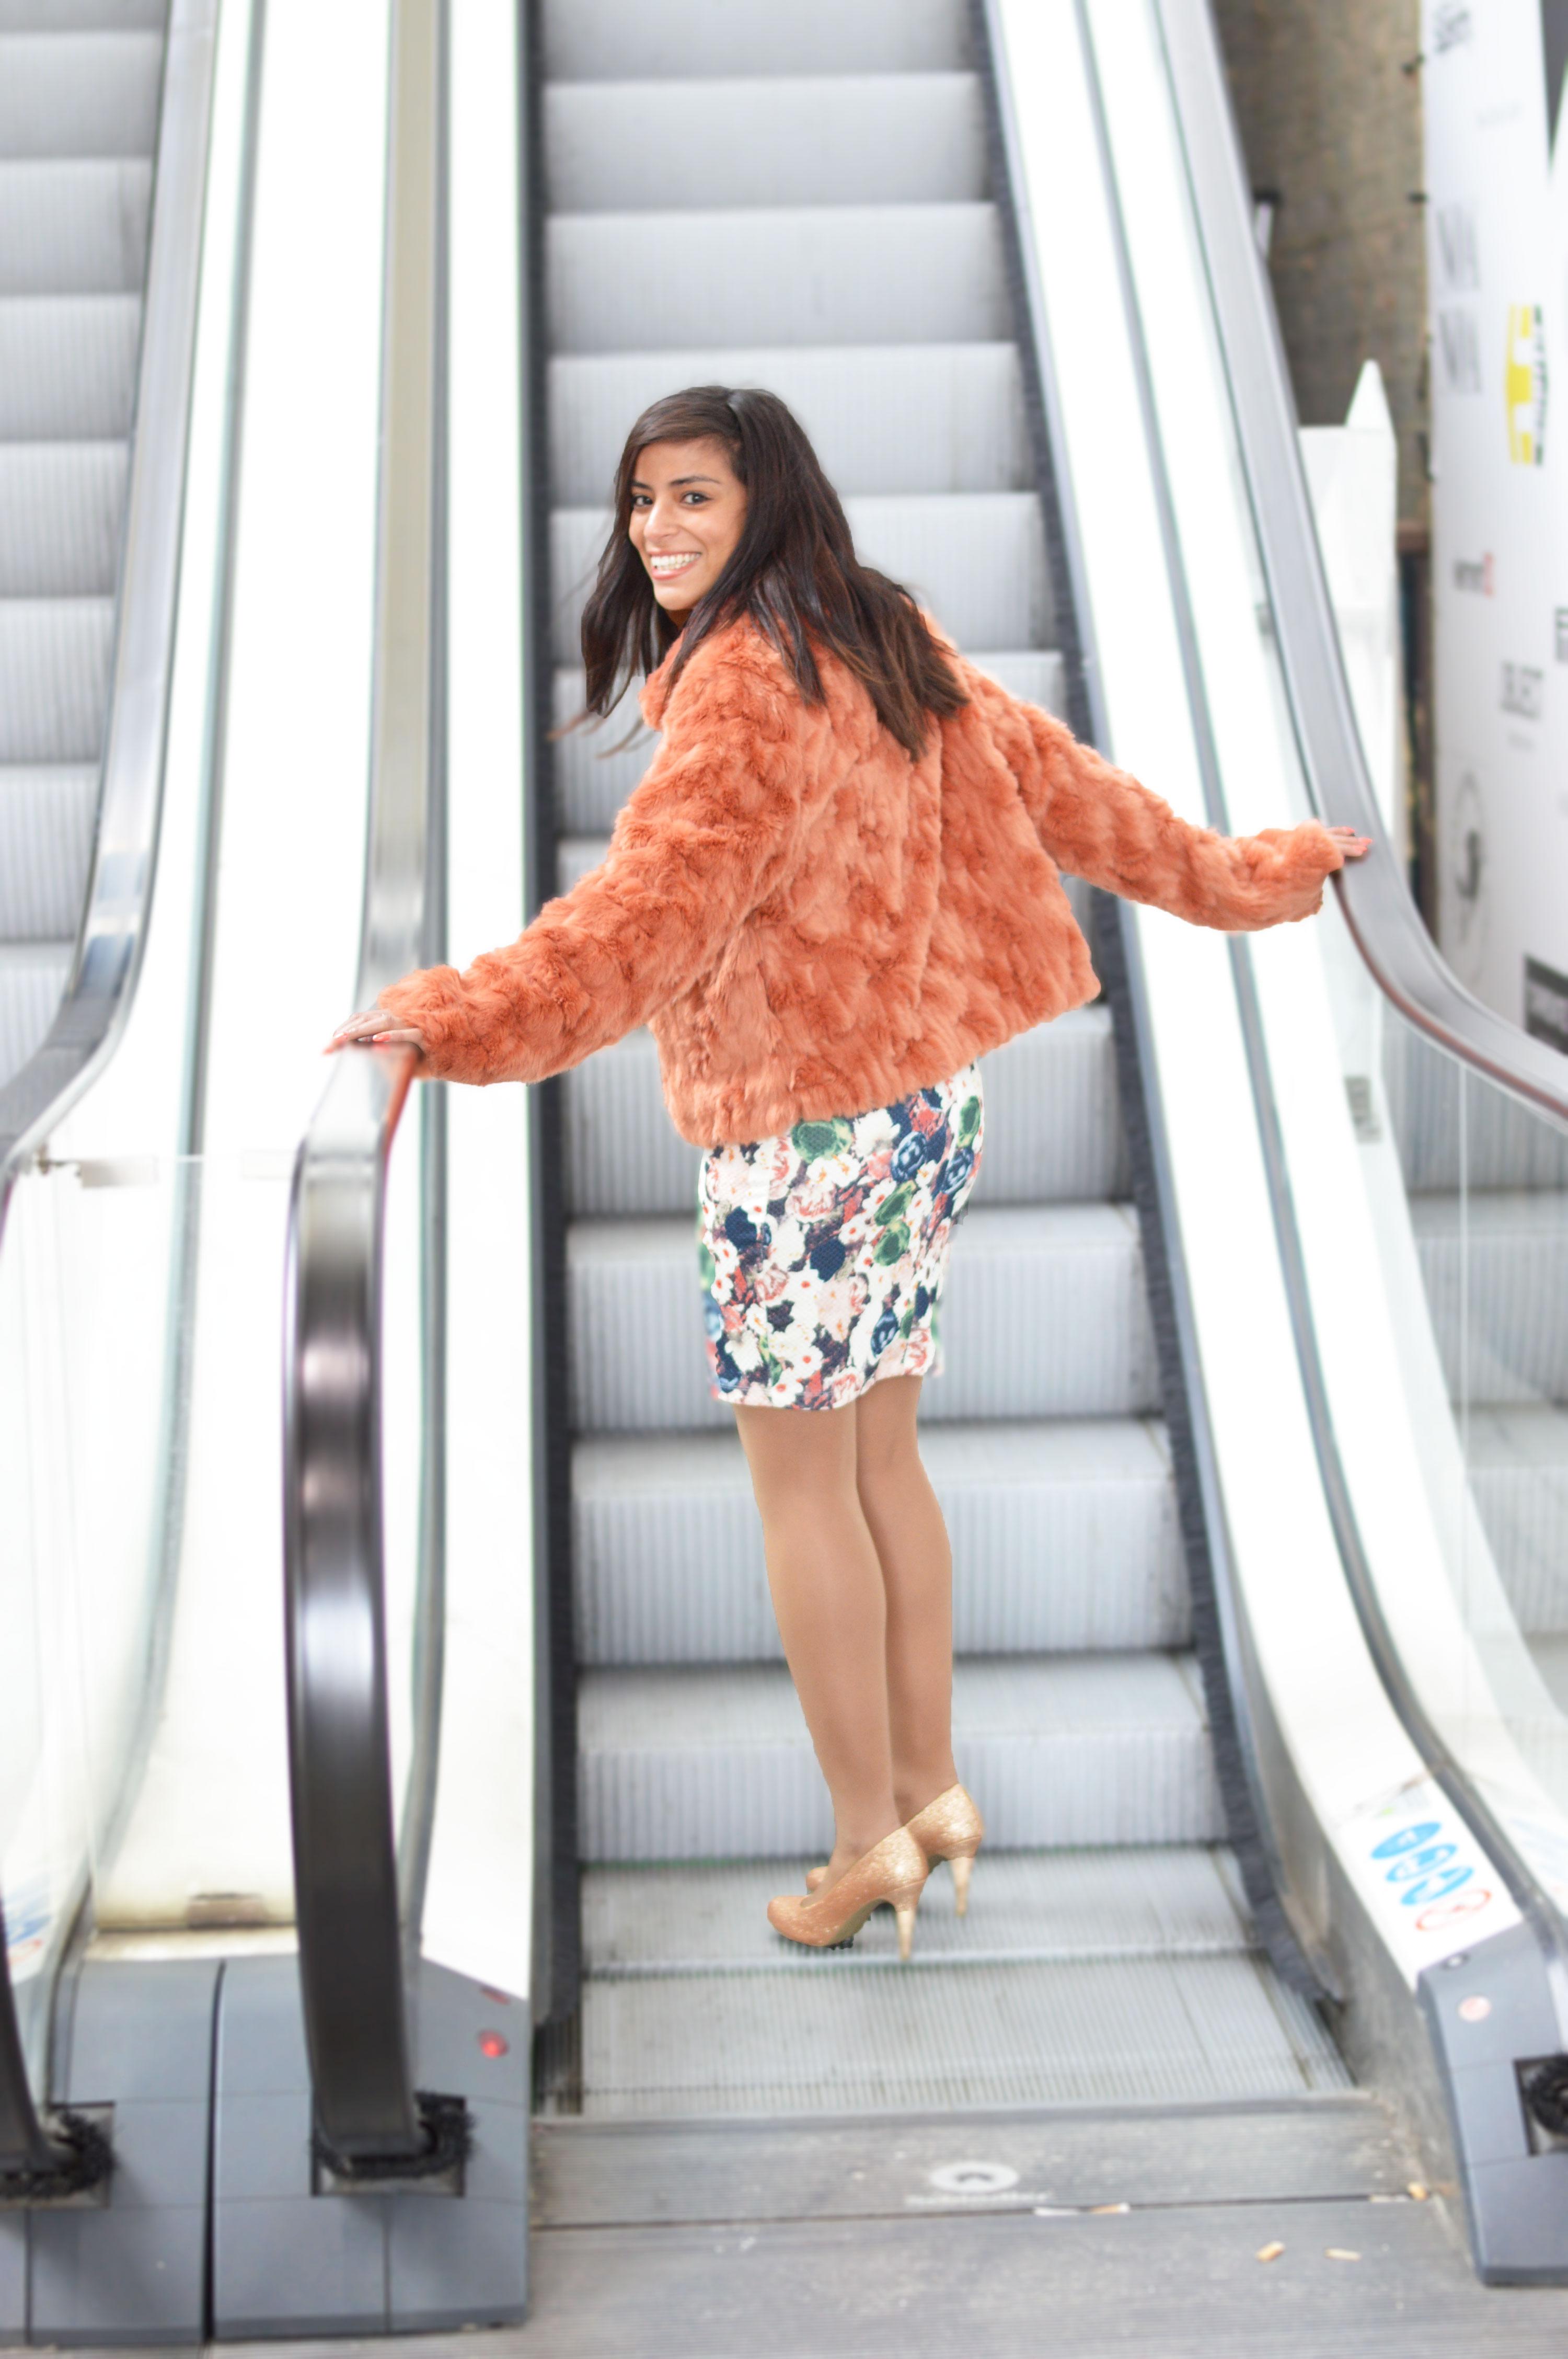 elevatorfun3